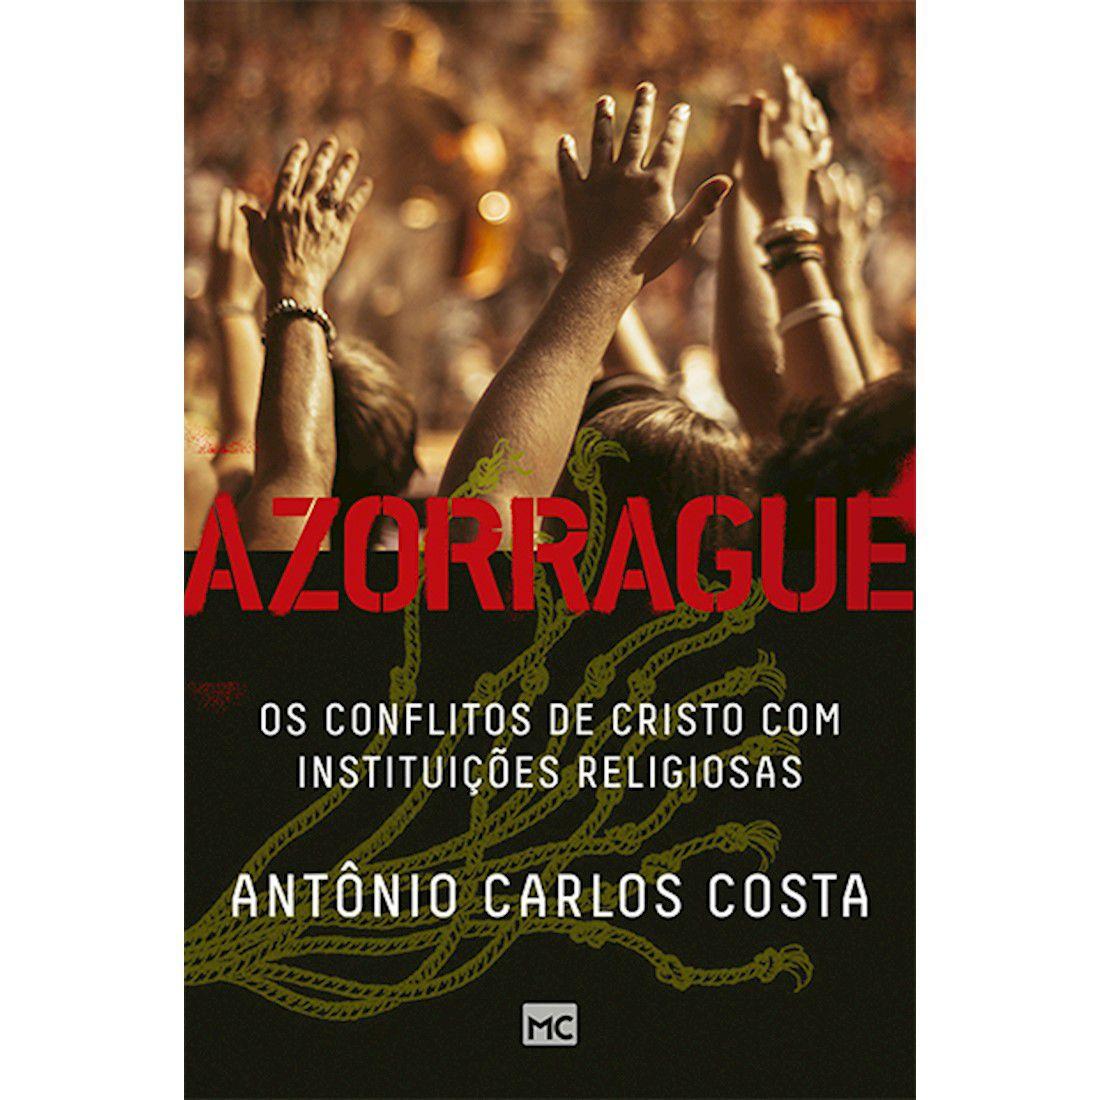 Livro Azorrague